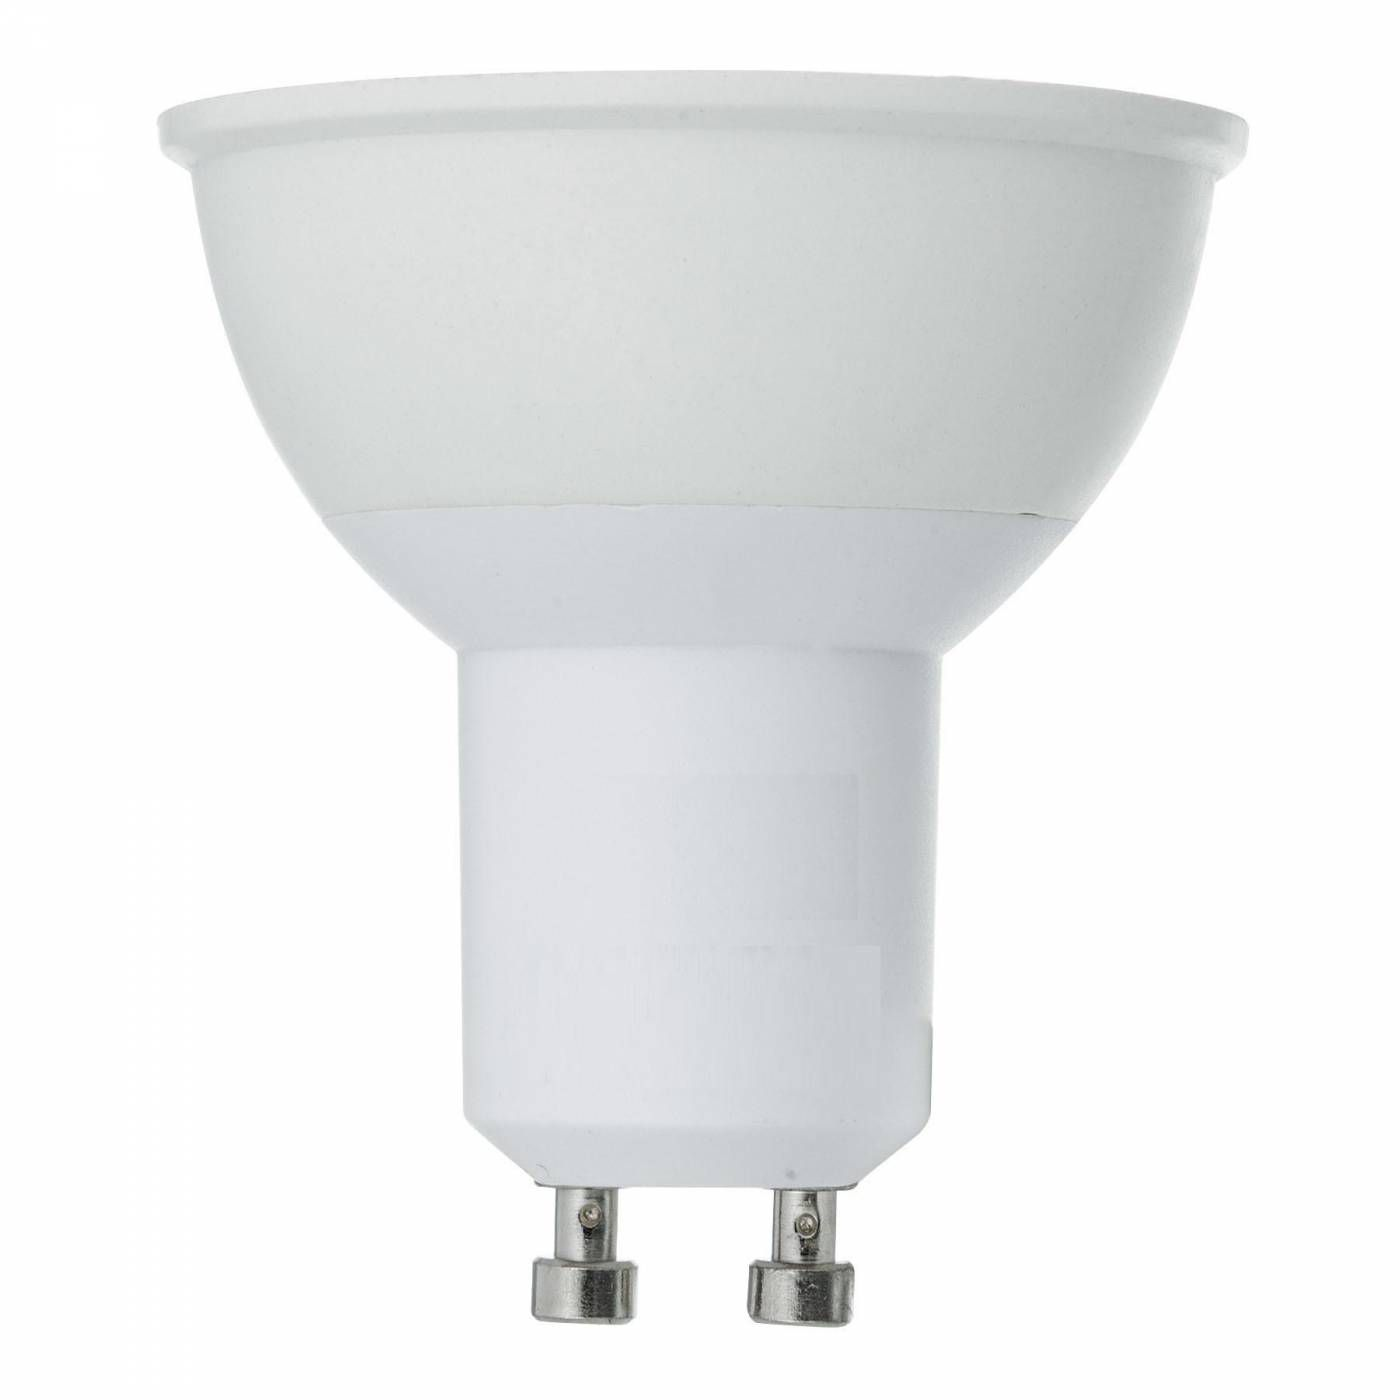 Lampada Dicroica LED 6W COB GU10 Bivolt - Branco Quente 2700K